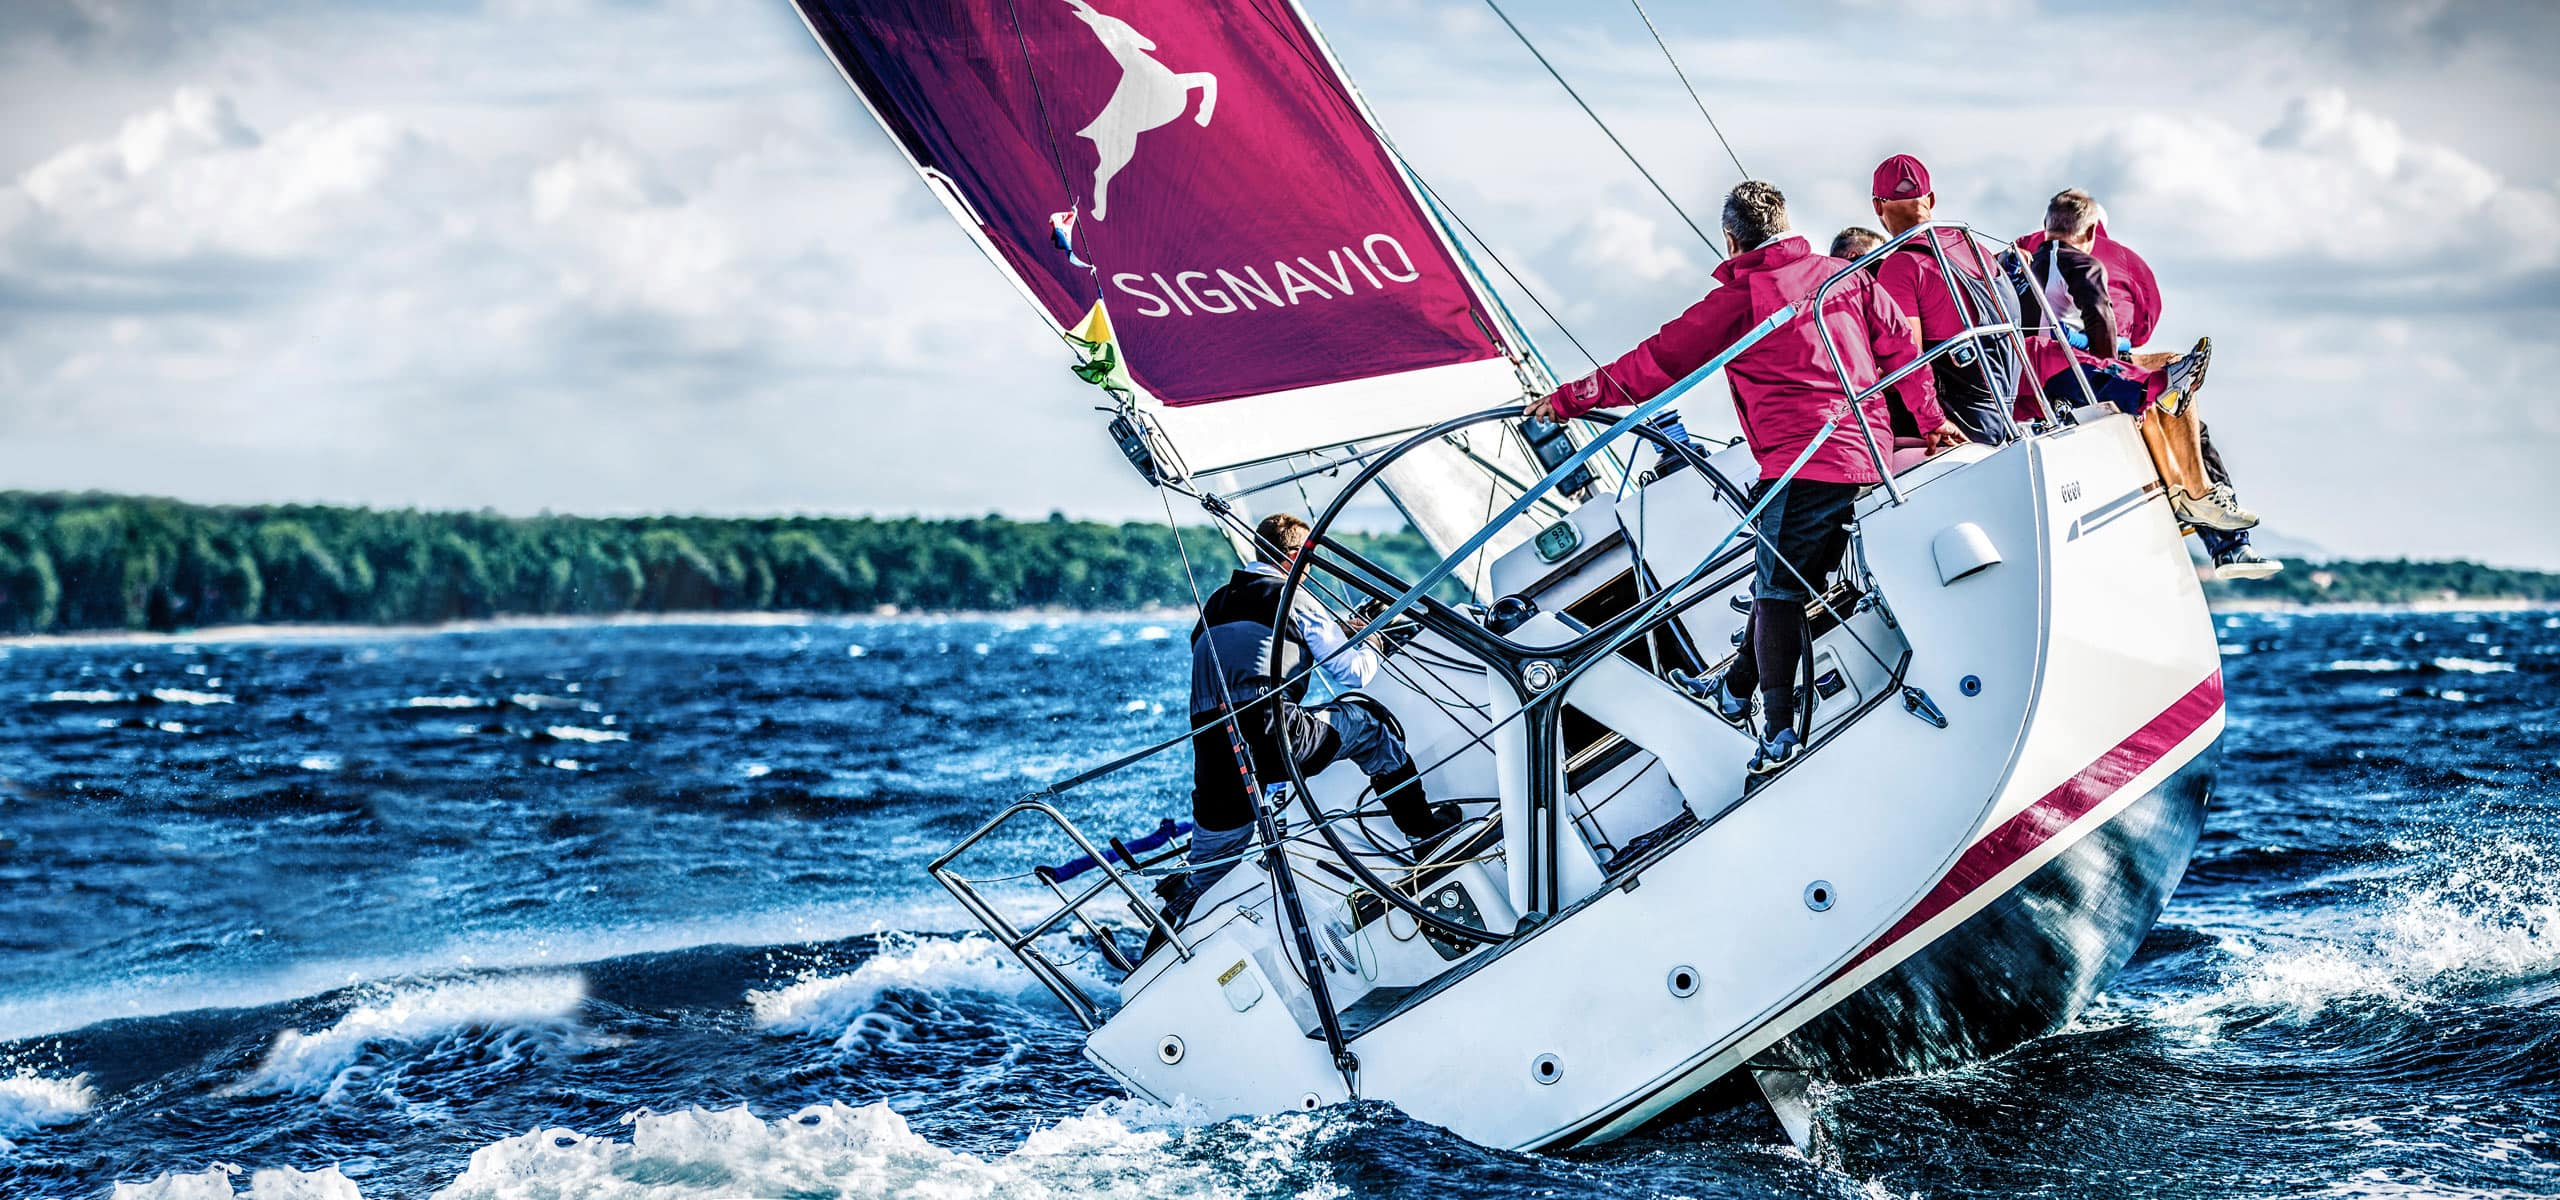 How Business Decision Management simplifies the organization of a sailing regatta.